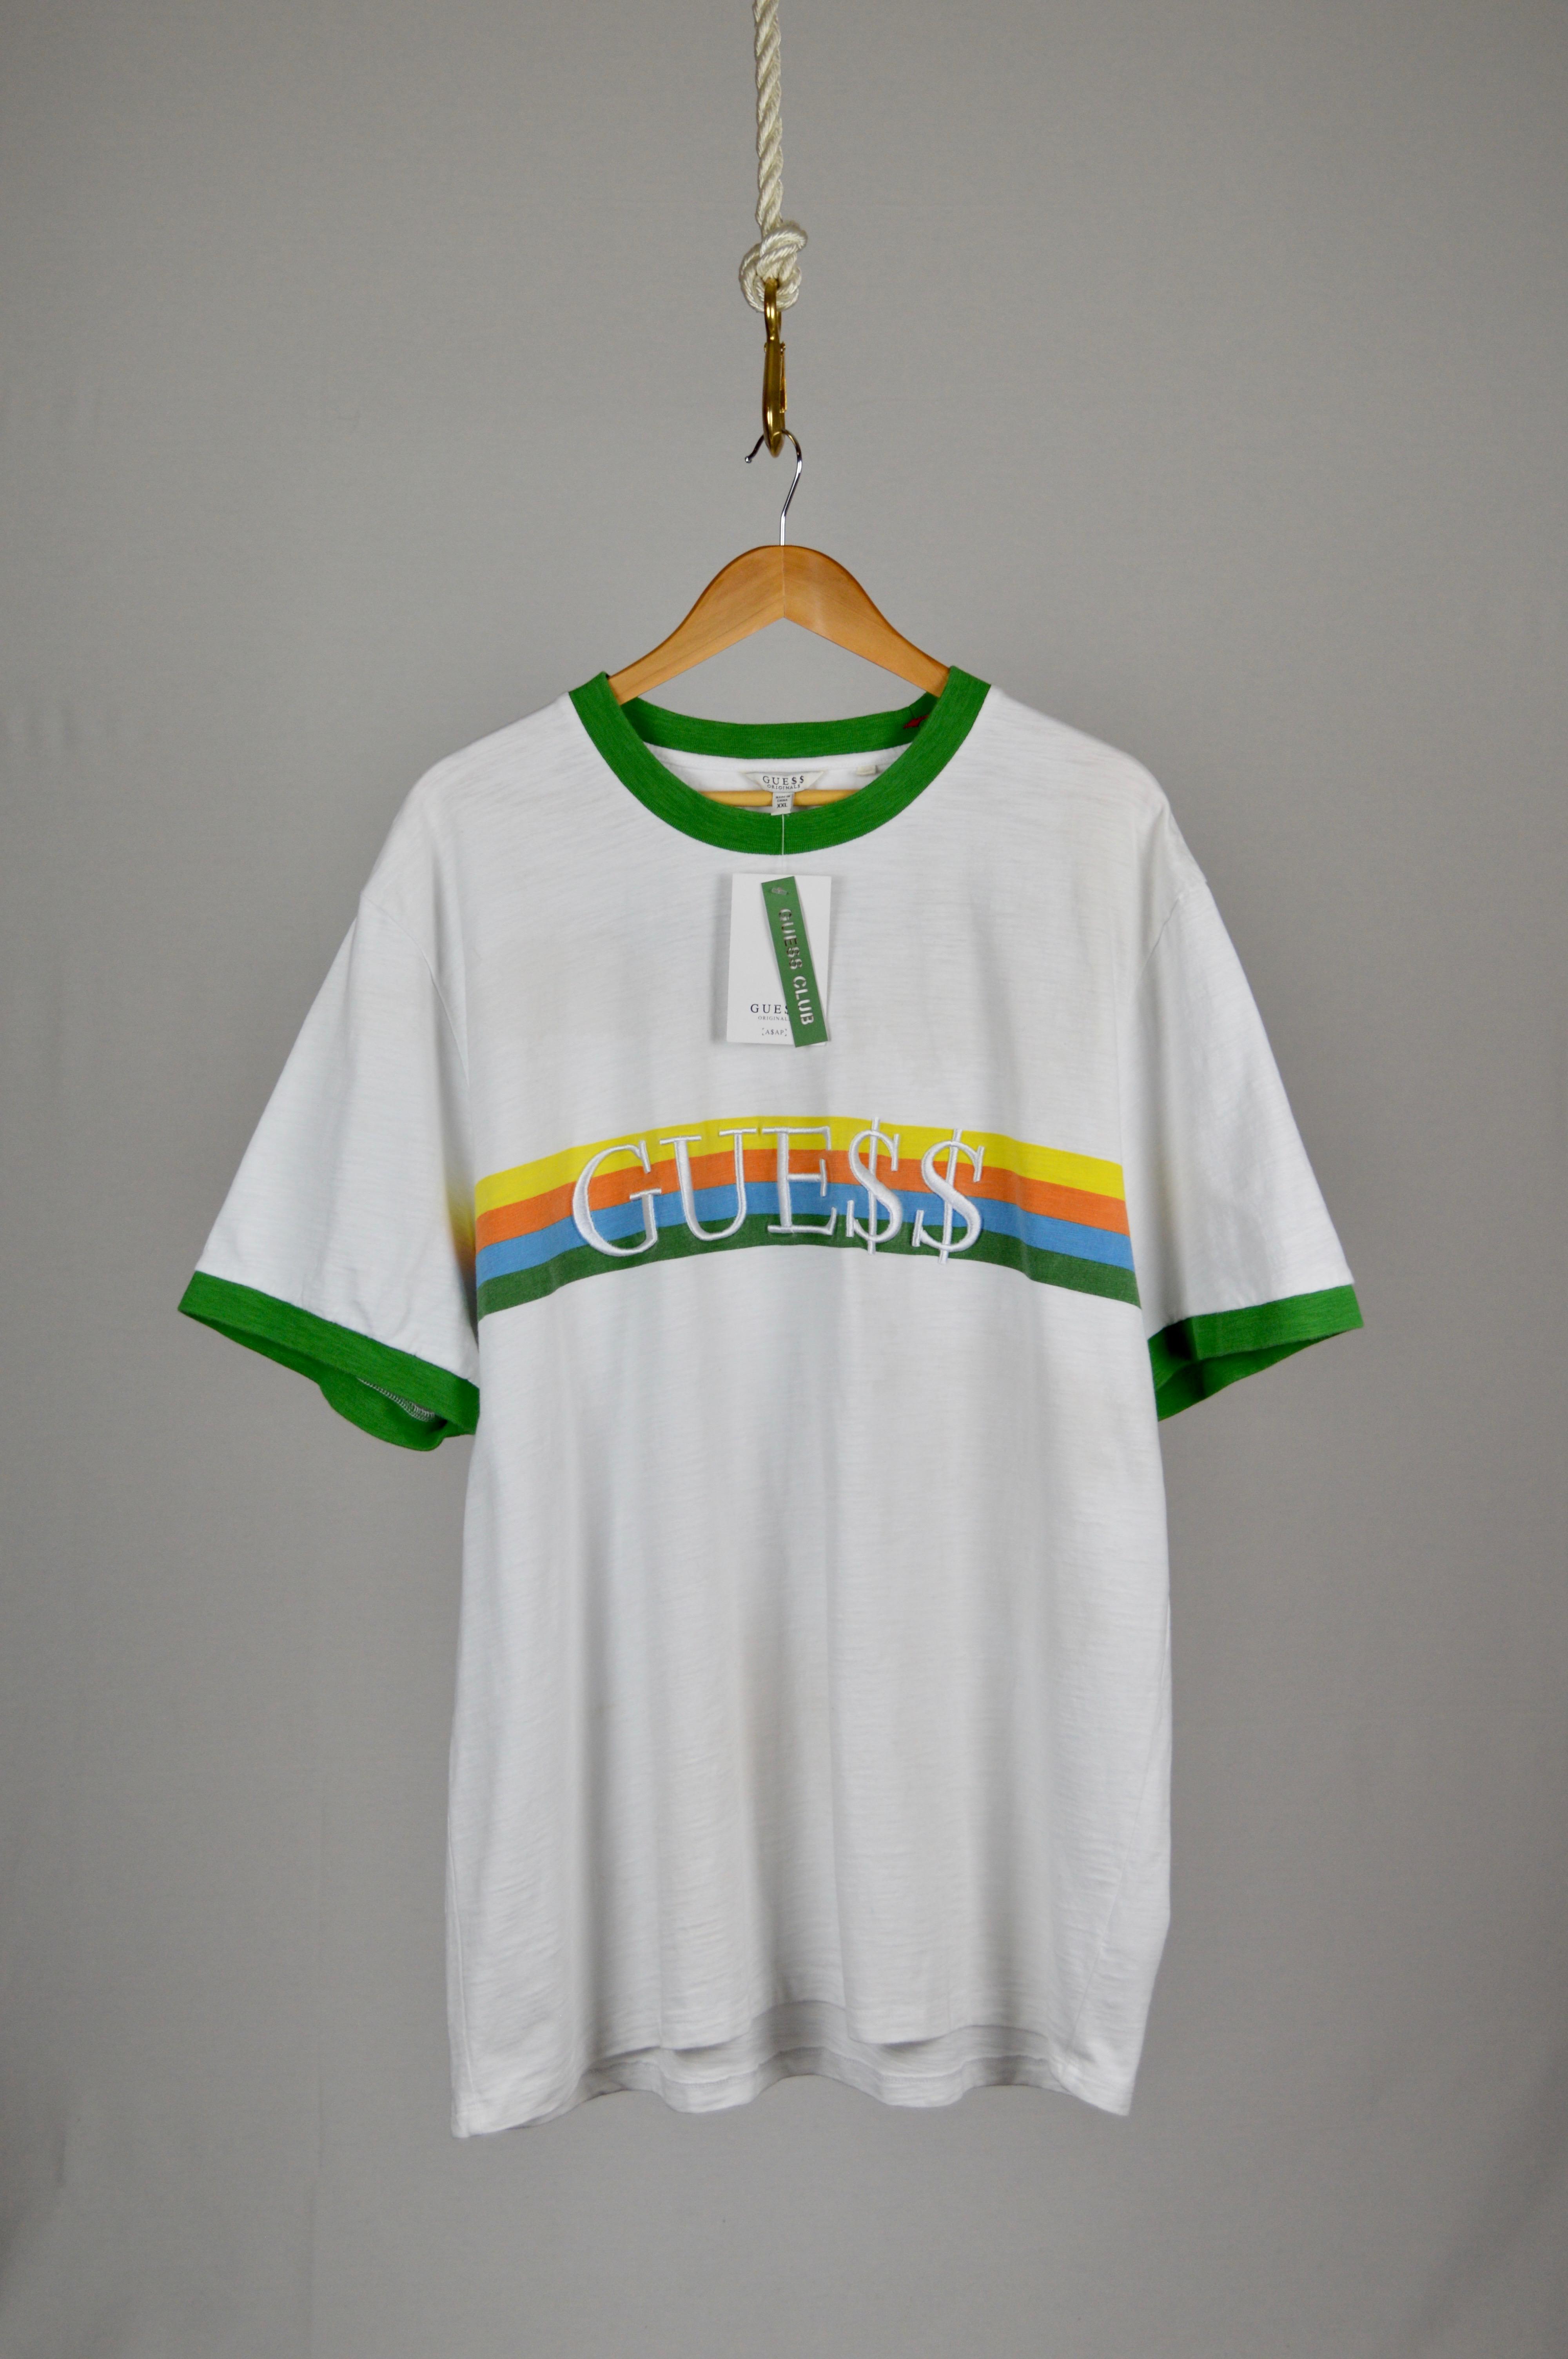 8092bb36e81e Guess A$ap Rocky X Gue$$ Green Collared S/s T-shirt   Grailed